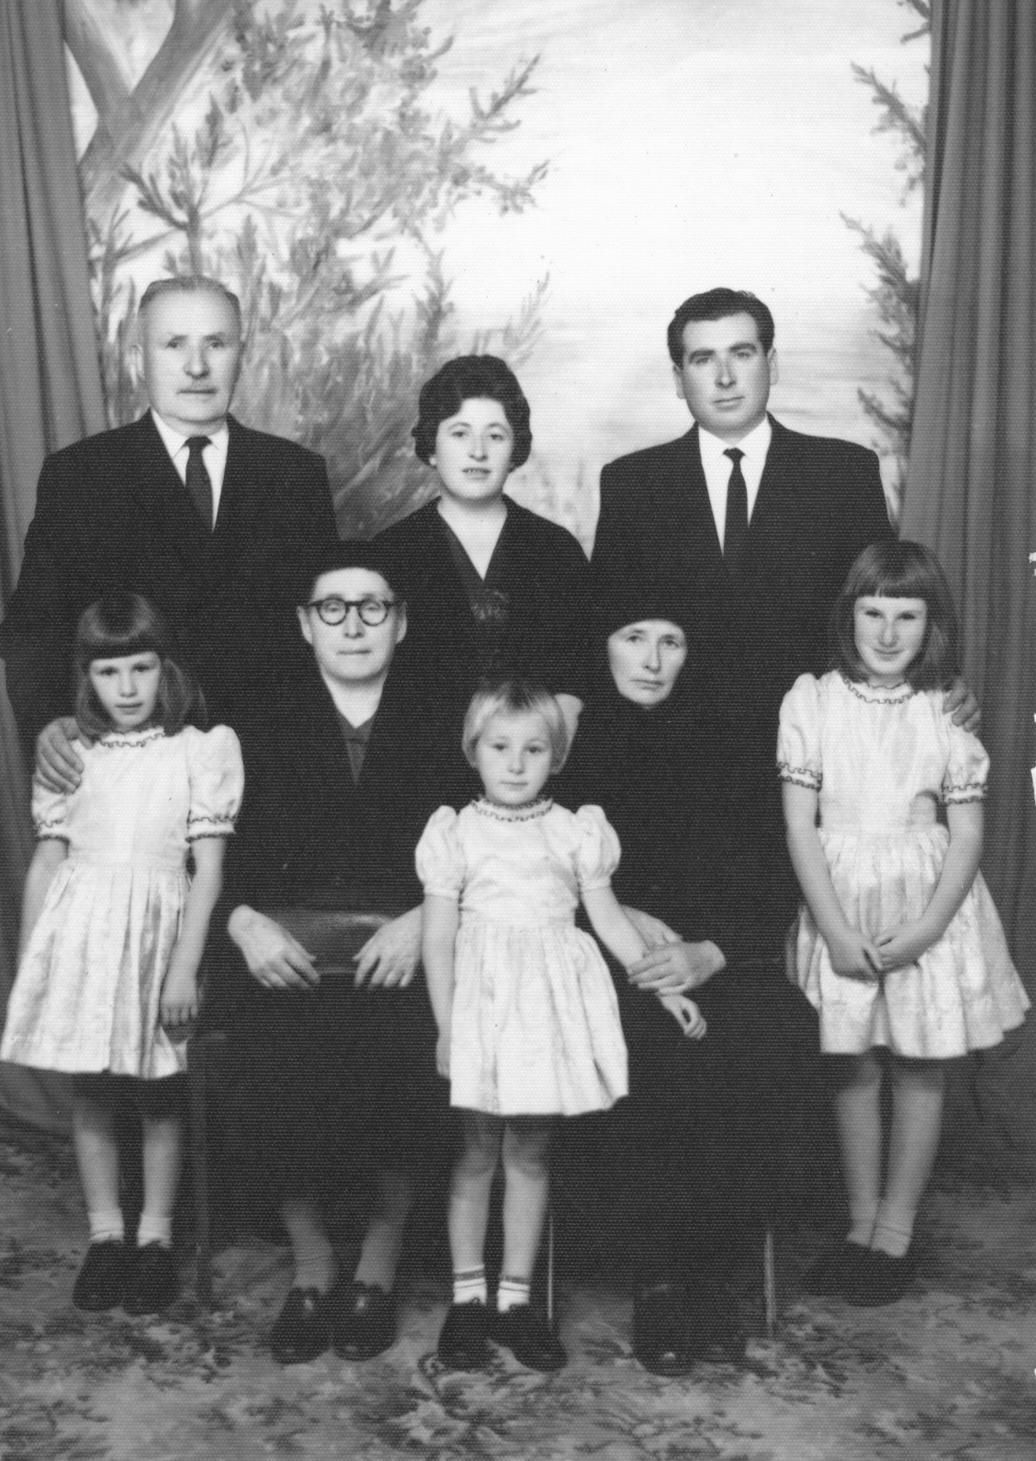 The Boshkoff, Dzodzoff, and Gligoroff families in Australia. (L to R): Vouiko Koleto Boshkoff, Vouina Anna Boshkova, Ditchka (Dzodzova) Gligorova, Prosha (Boshkova) Dzodzova, and Atanas Gligoroff the husband of Ditchka from Bamboki. The three girls standing in front are the daughters of Atanas and Ditchka Gligoroff.